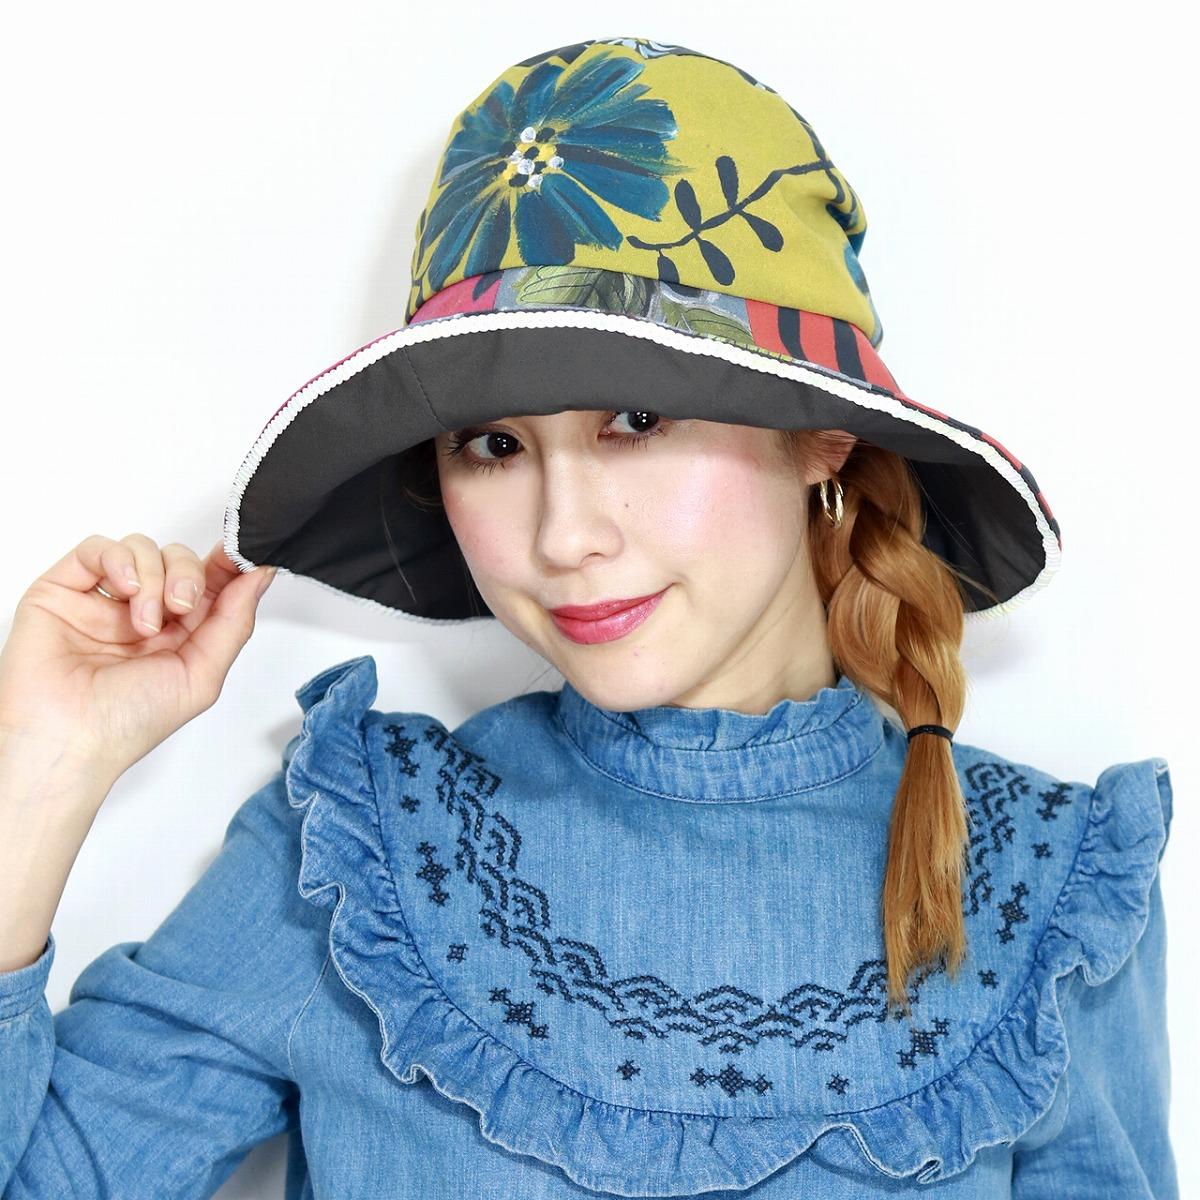 d1483578 ELEHELM HAT STORE: Rosy hat flower parade hat Lady's saliva wide hat floral  design Mrs. hat cotton Barairo no Boushi flower patchwork individual woman  hat ...